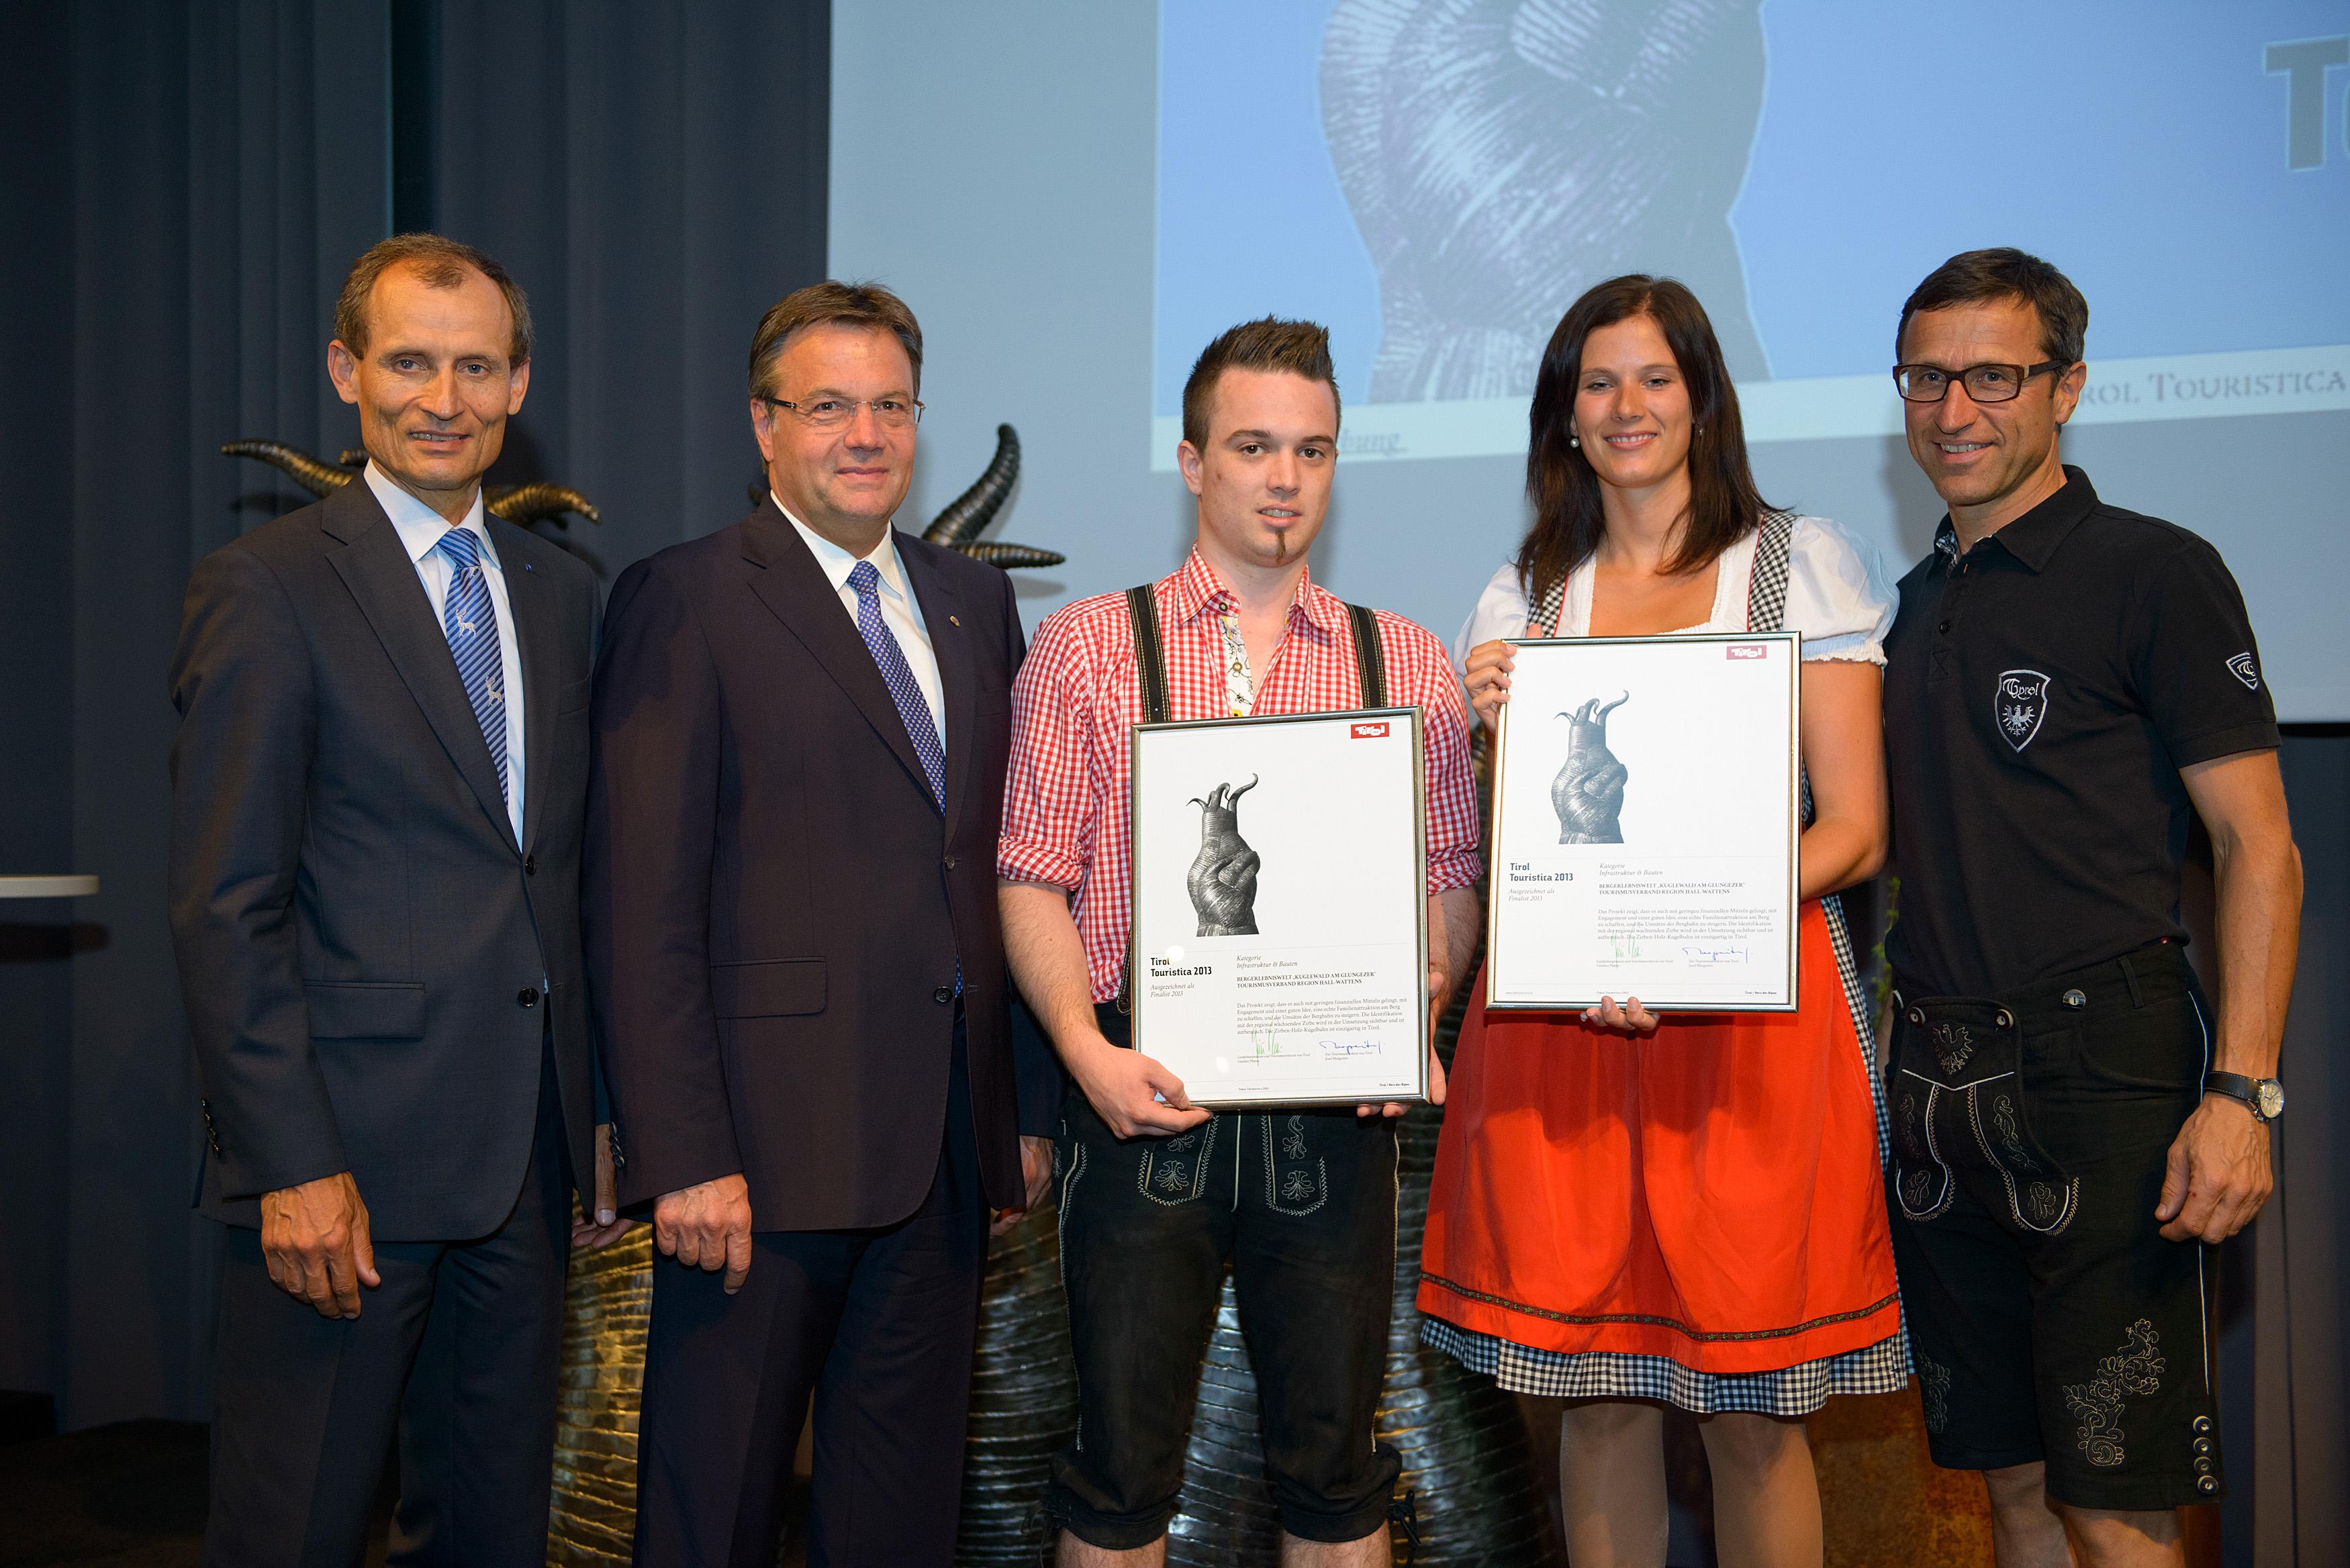 Verleihung Anerkennungspreis (c)Tirol Werbung